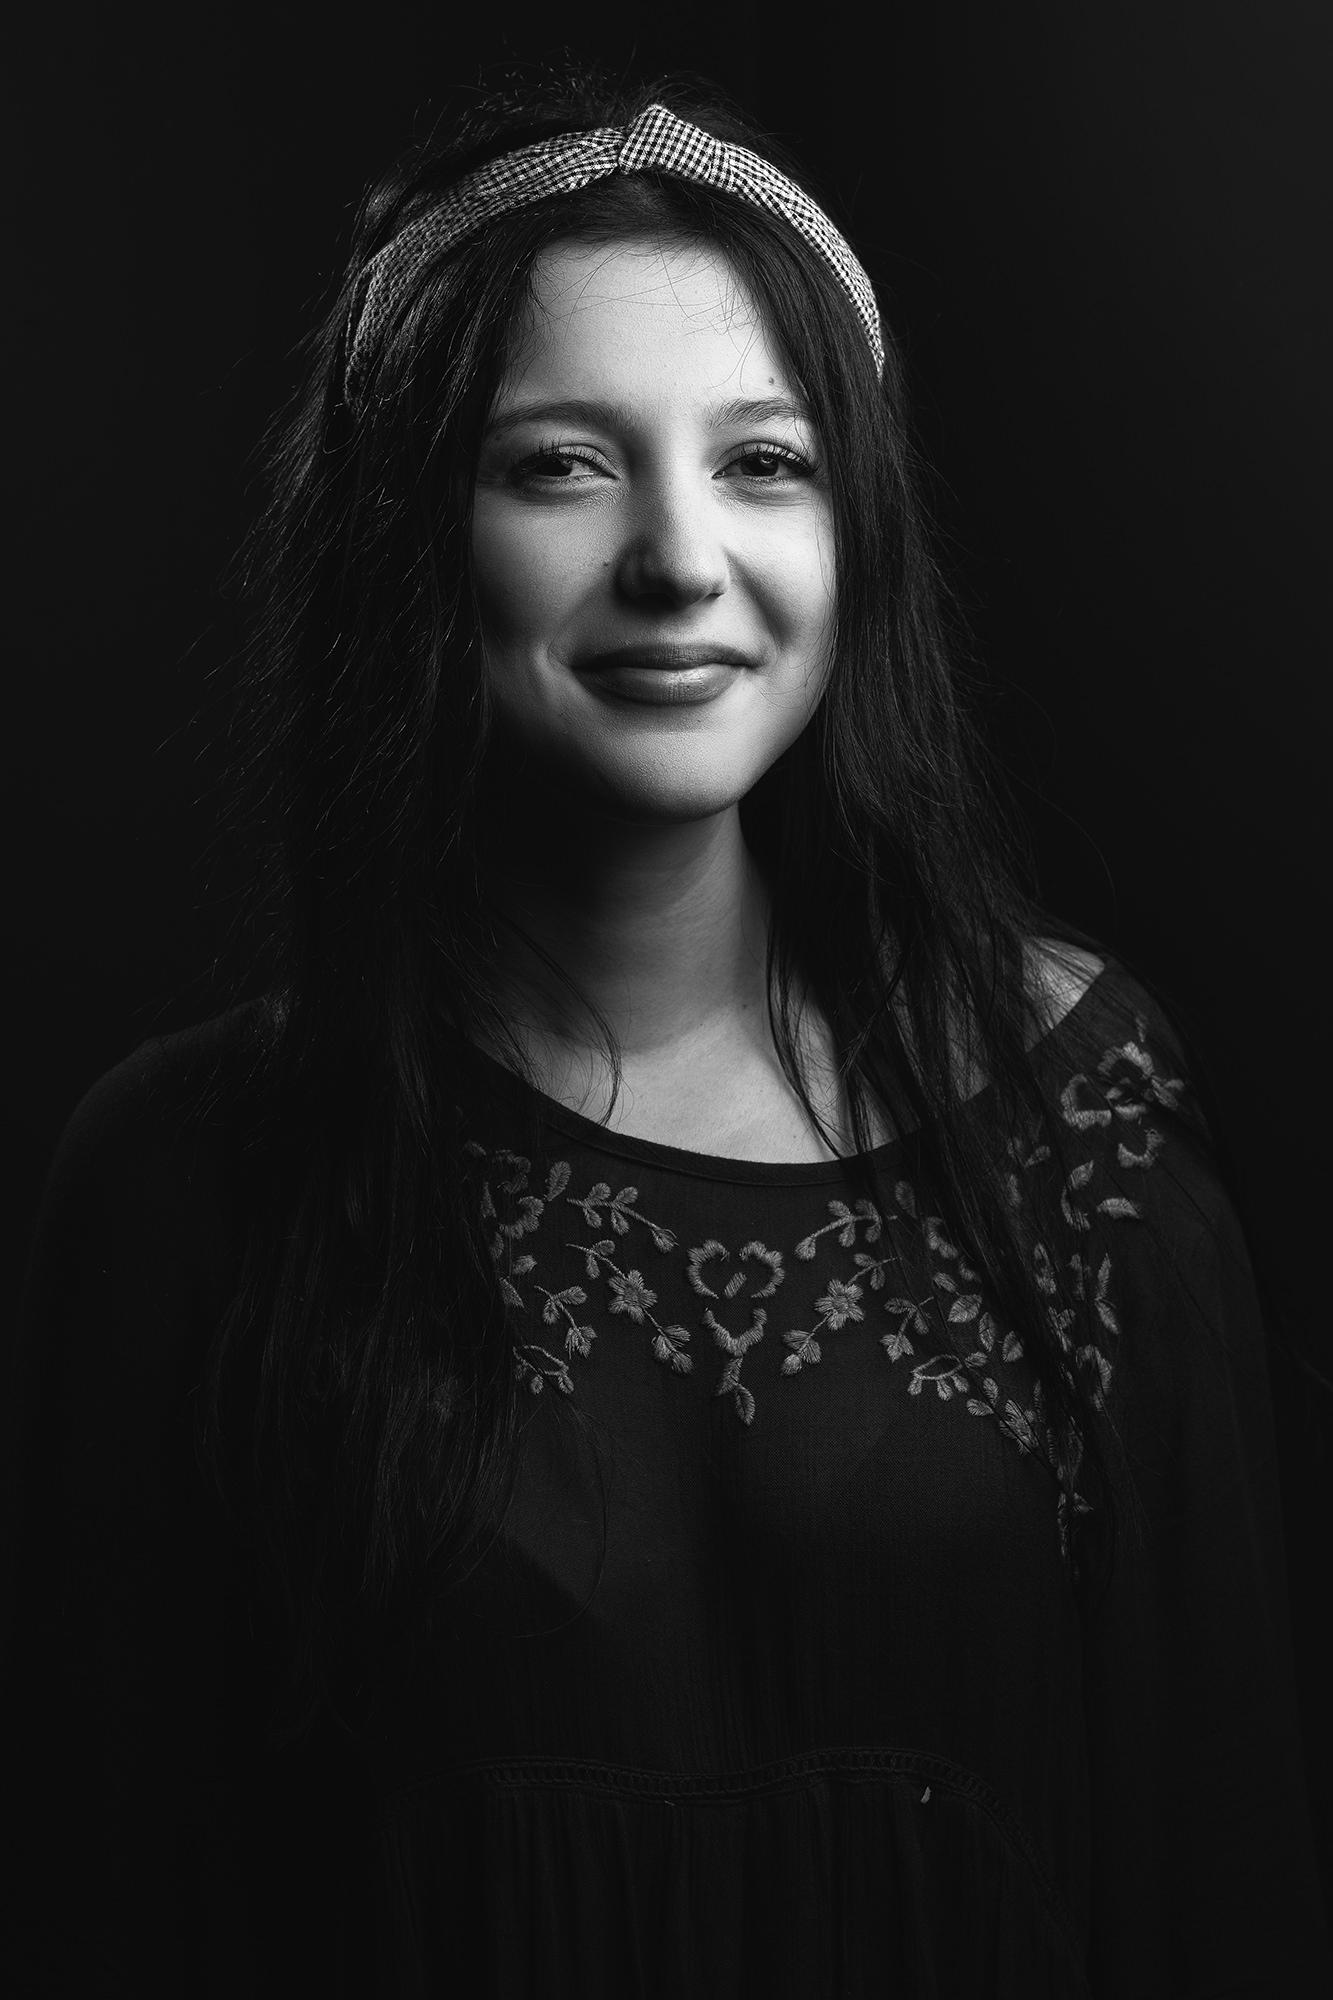 julia mammone - guitarenlight